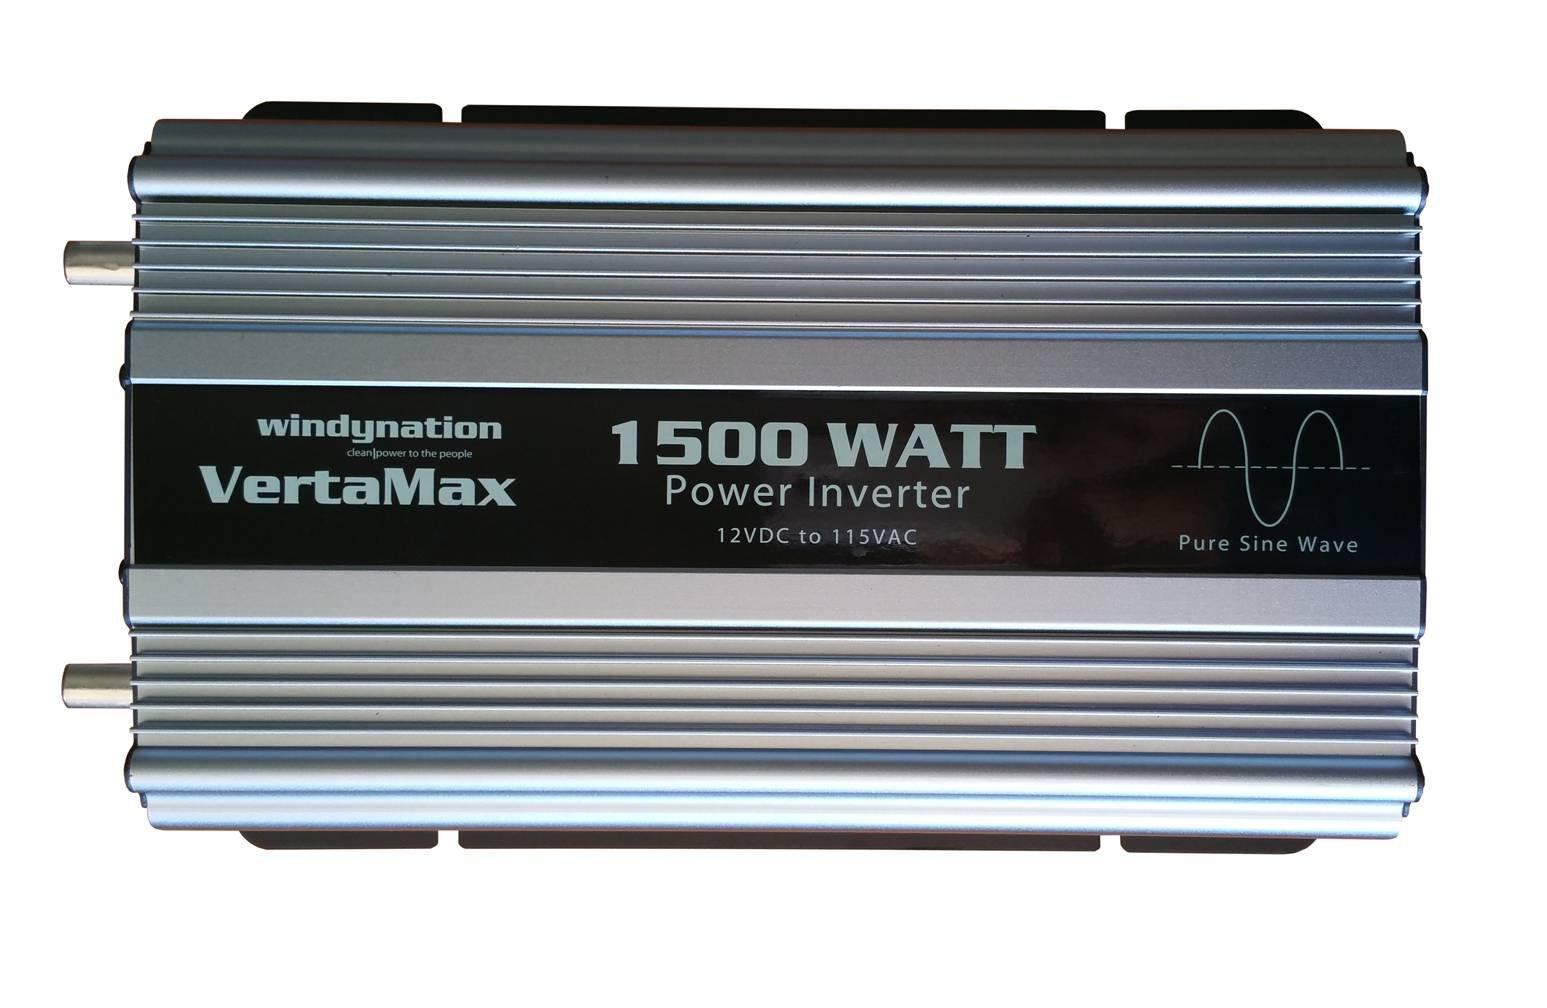 VertaMax PURE SINE WAVE 1500 Watt (3000W Surge) 12V Power Inverter DC to 115 AC Car, Solar, Off-Grid, RV, Back Up Power by WindyNation (Image #4)